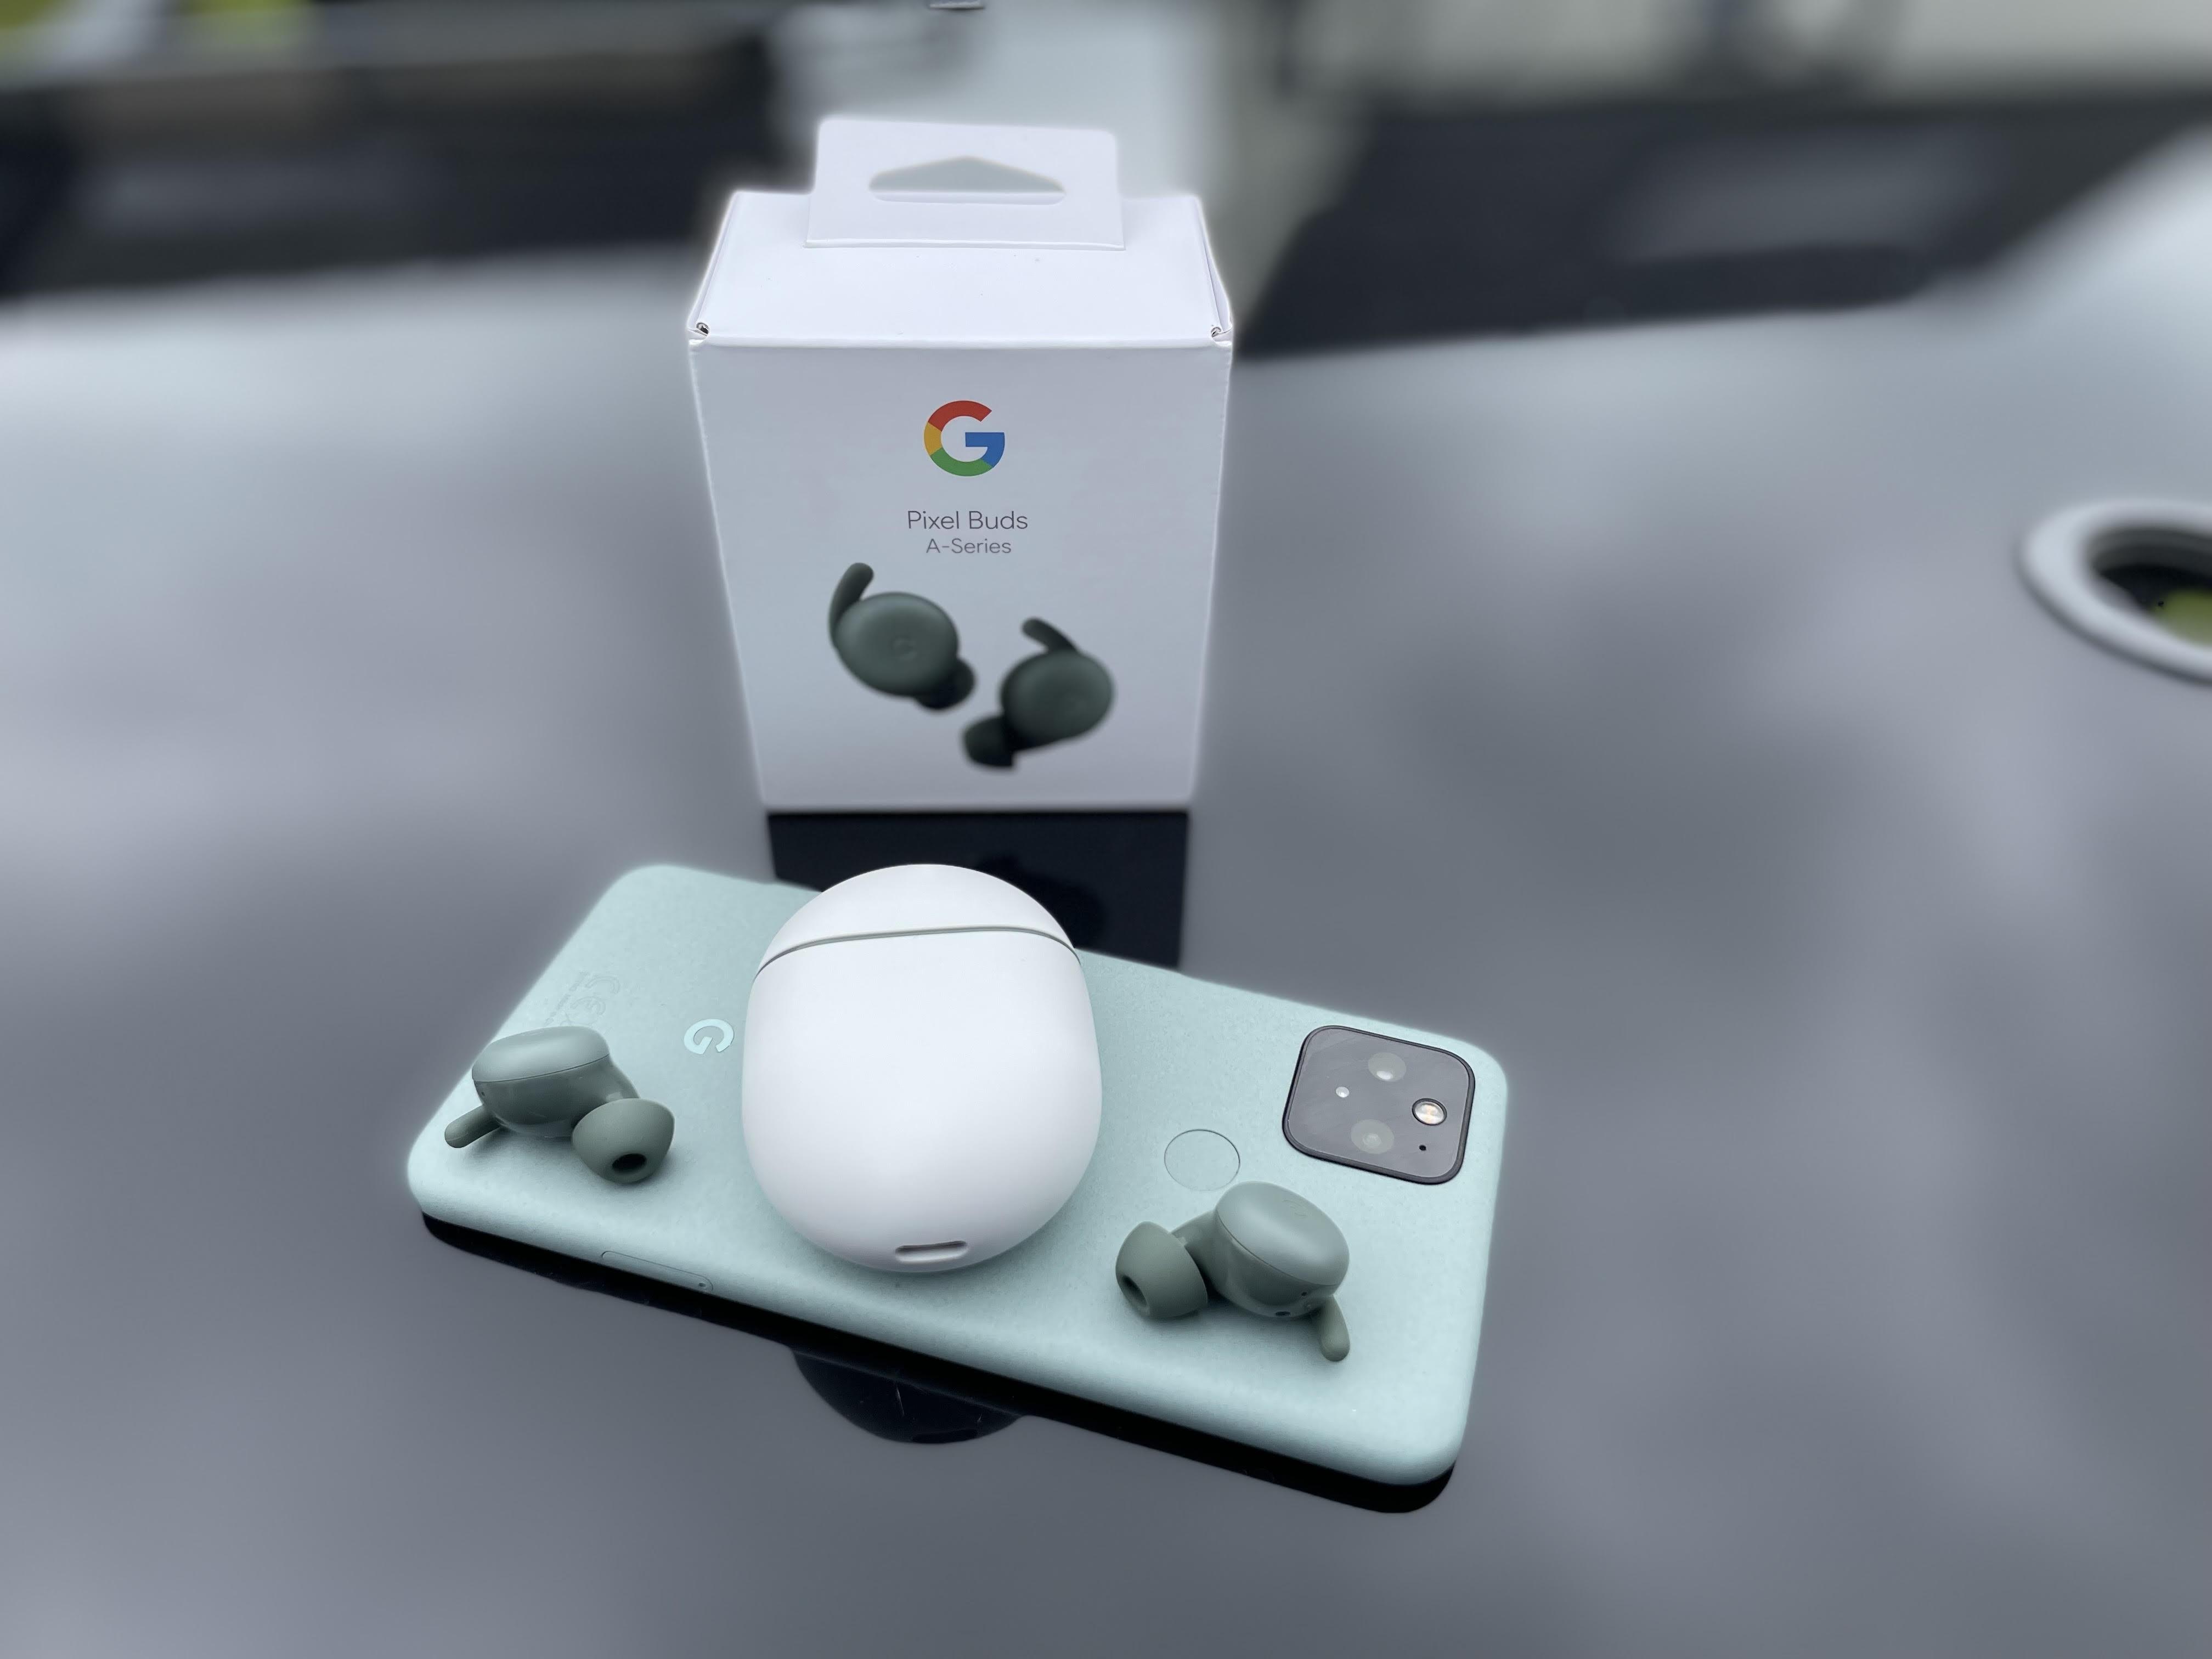 Google pixelbuds A-Series on Pixel 5